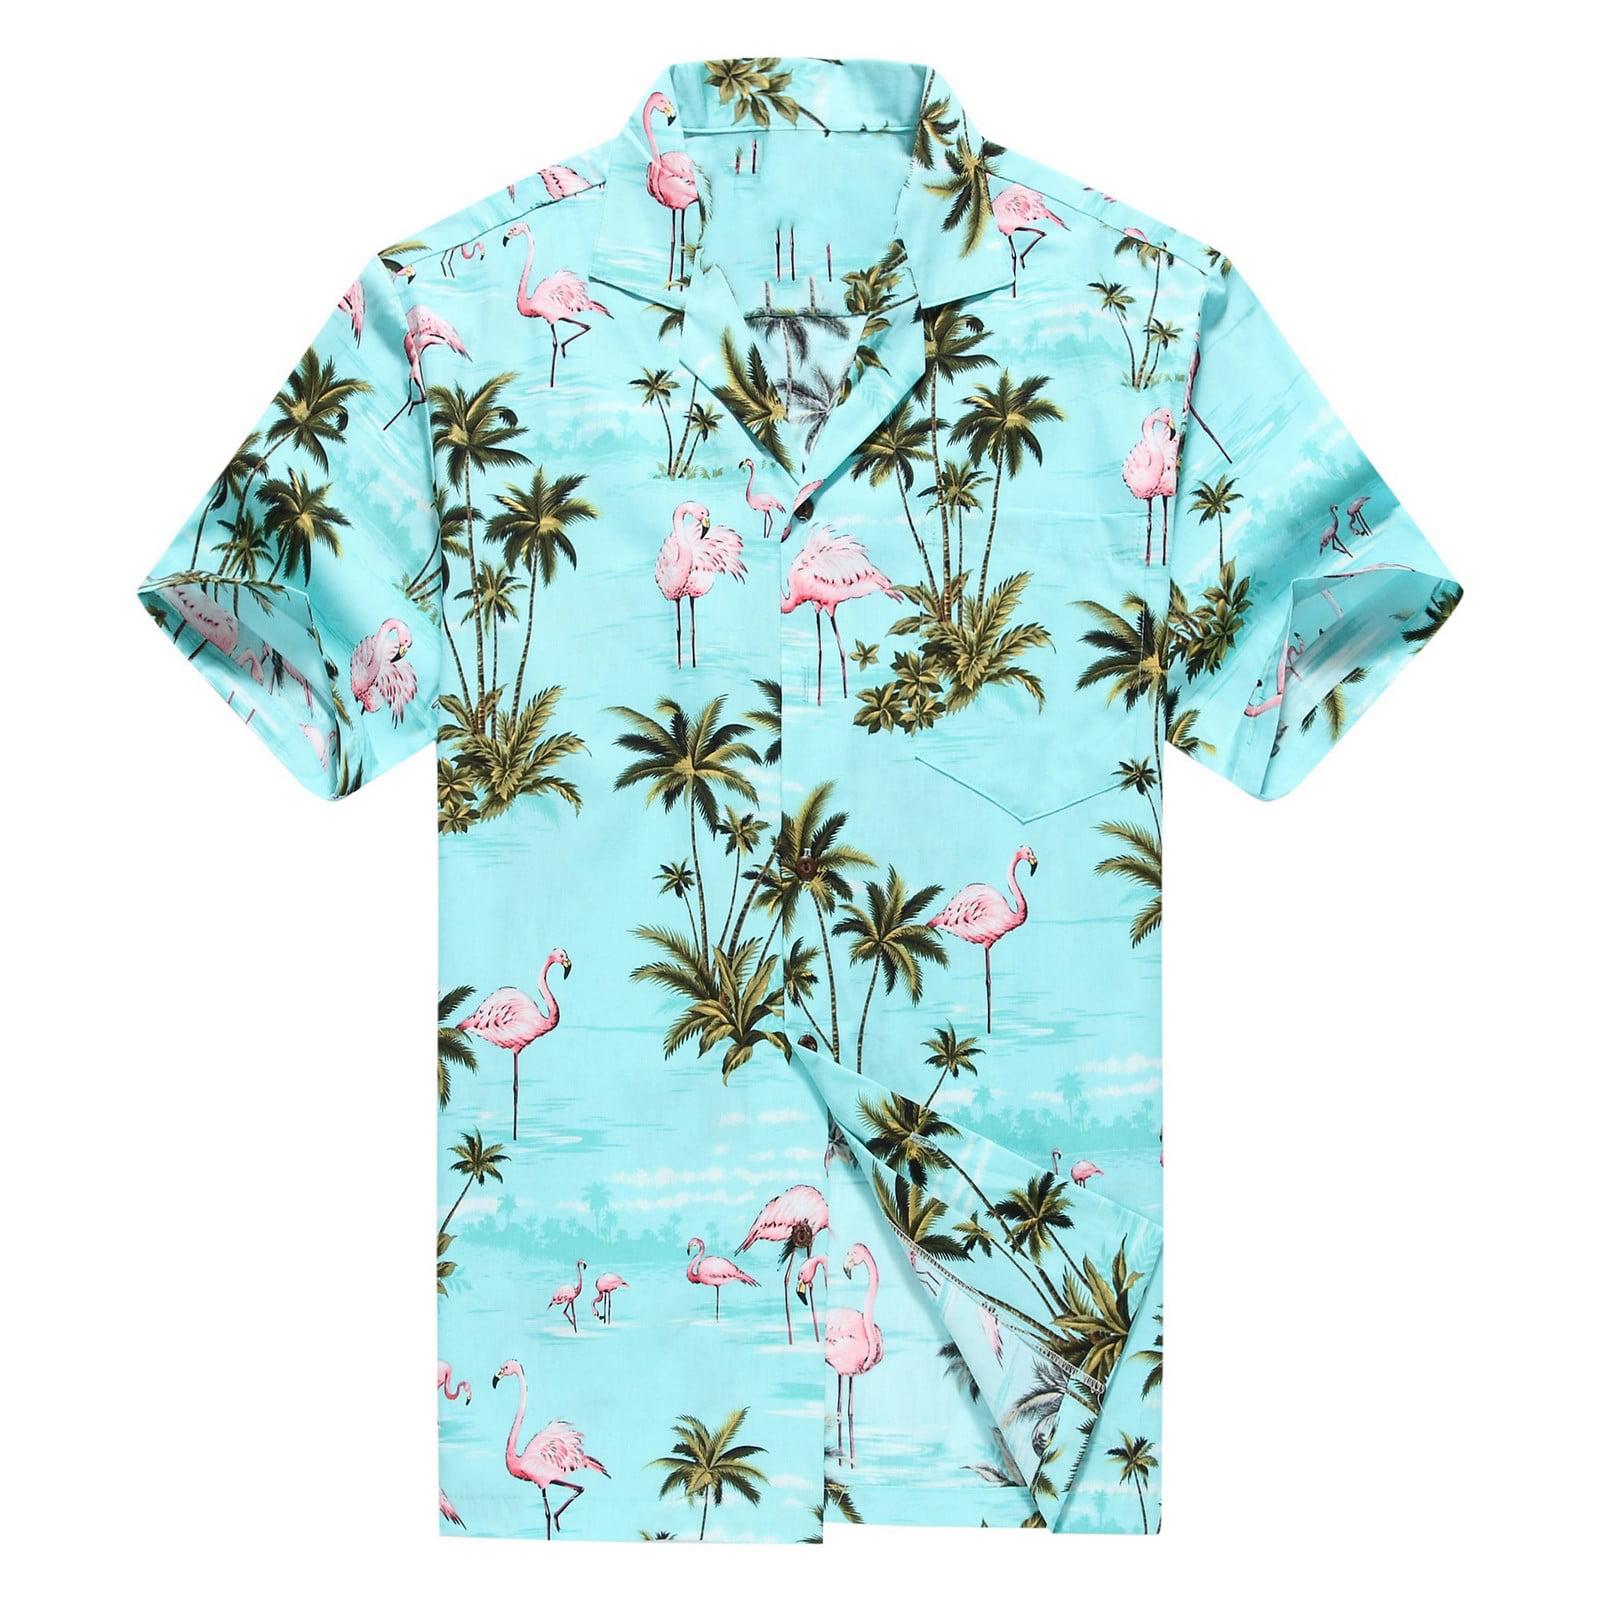 939212e689d Hawaii Hangover - Made in Hawaii Men s Hawaiian Shirt Aloha Shirt Pink  Flamingos Allover in Turquoise - Walmart.com